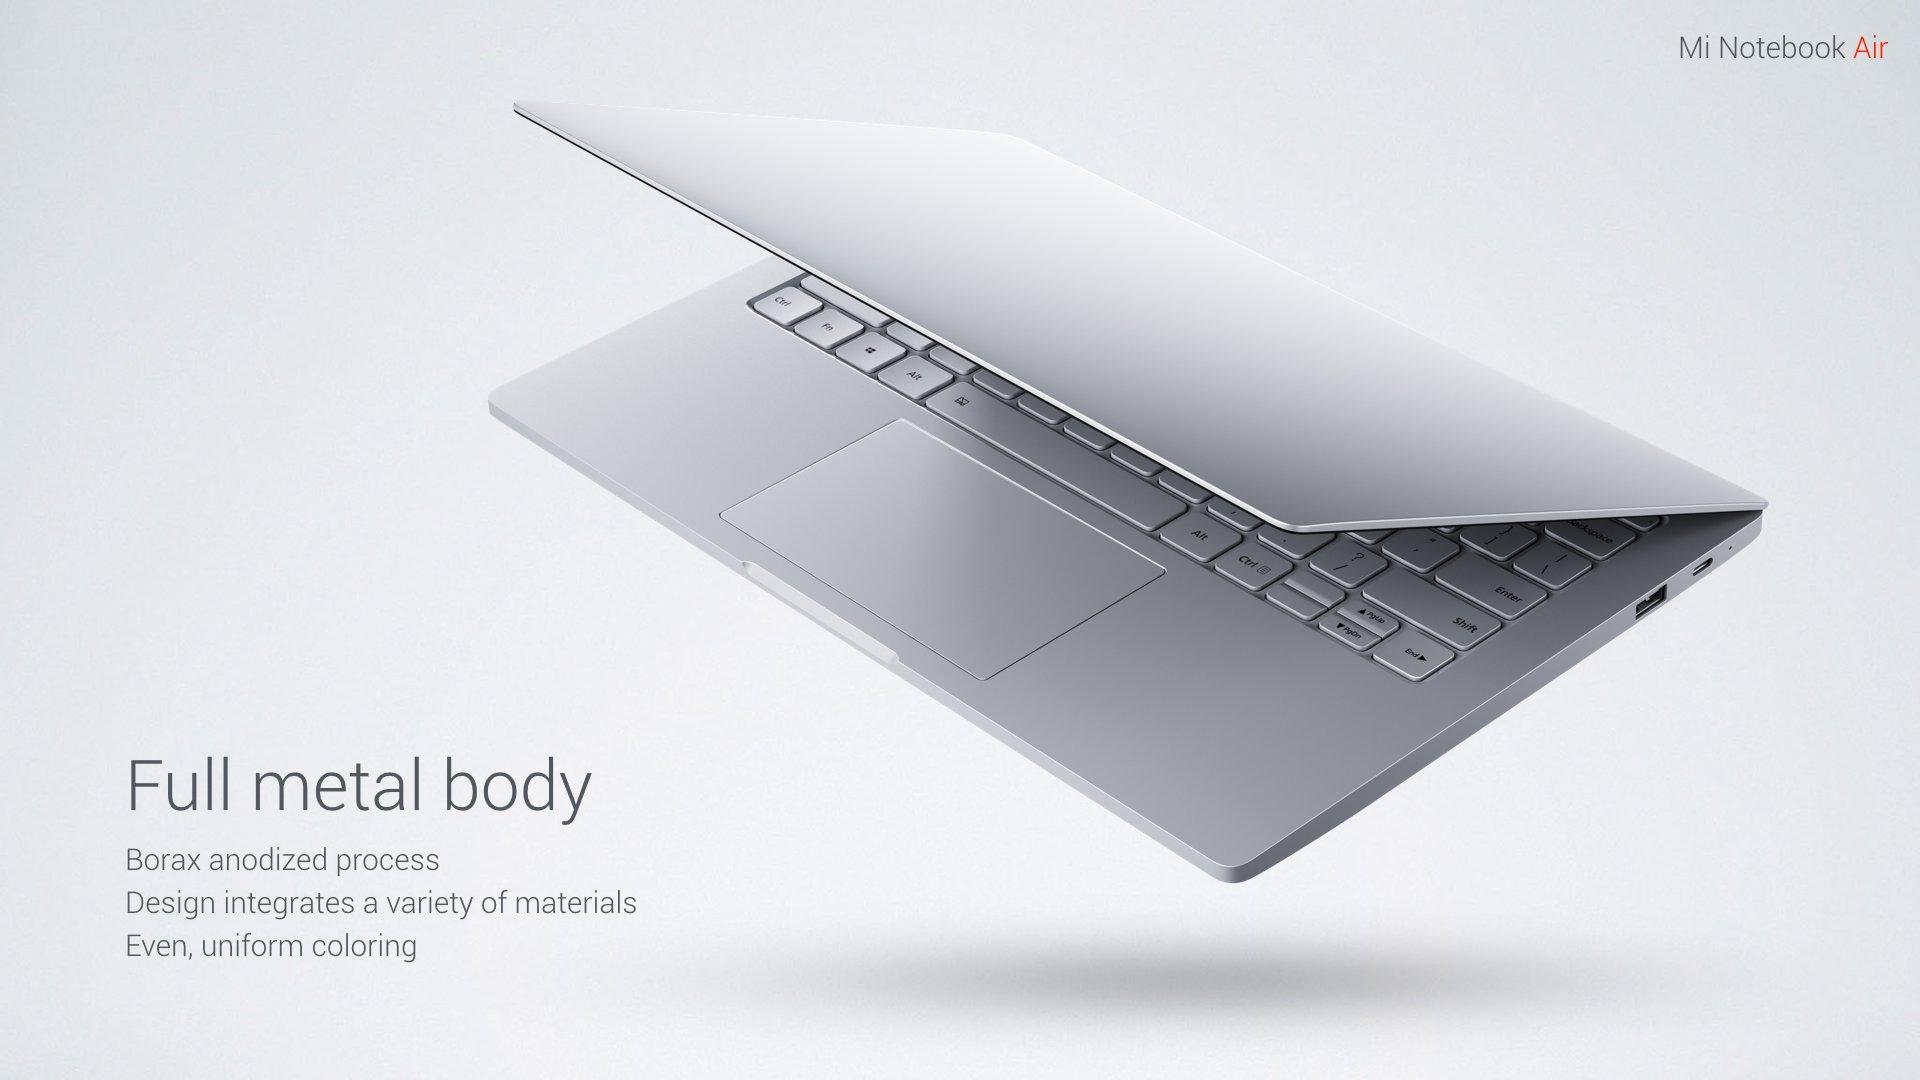 Xiaomi unveils the Mi Notebook Air, its Macbook Air killer 1